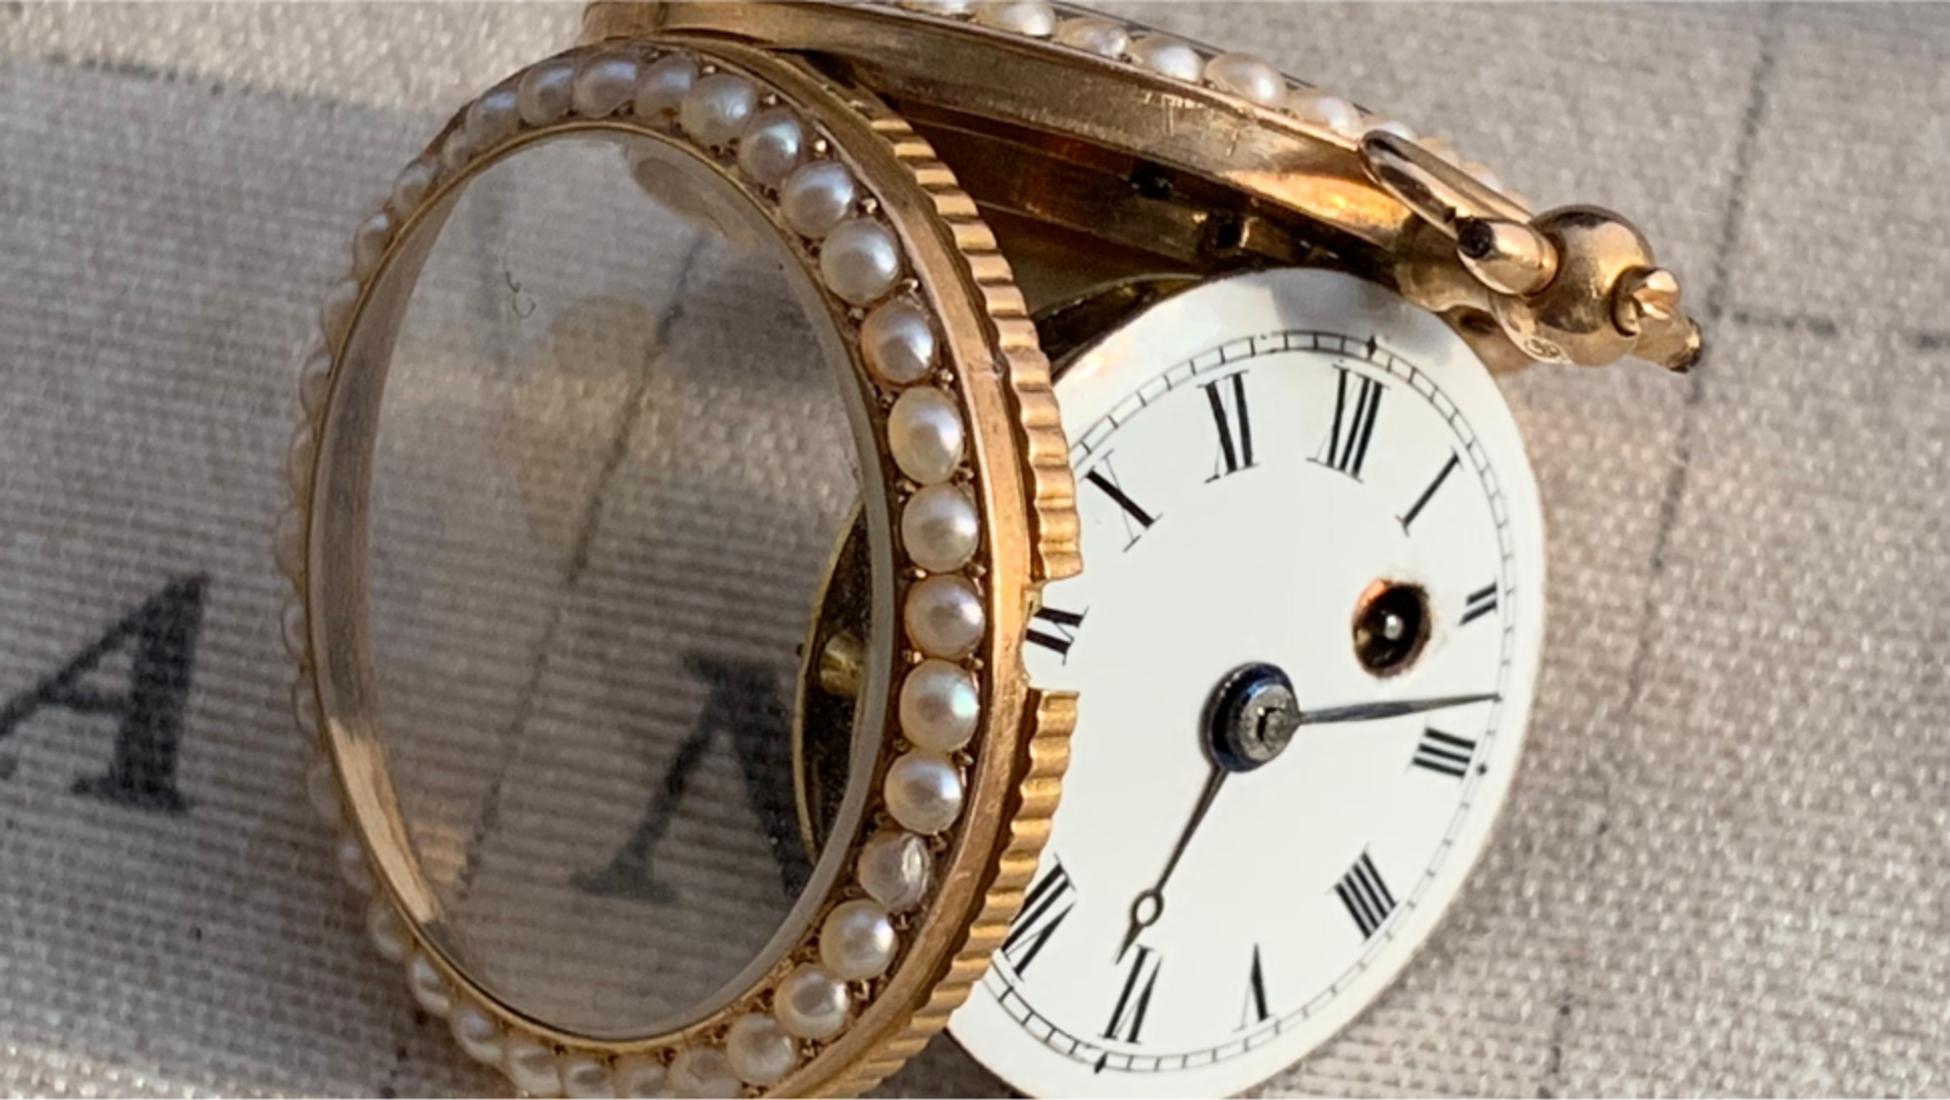 a38385bd1b48 Observar cómo mi hermano reparaba relojes de bolsillo me animó a comprar